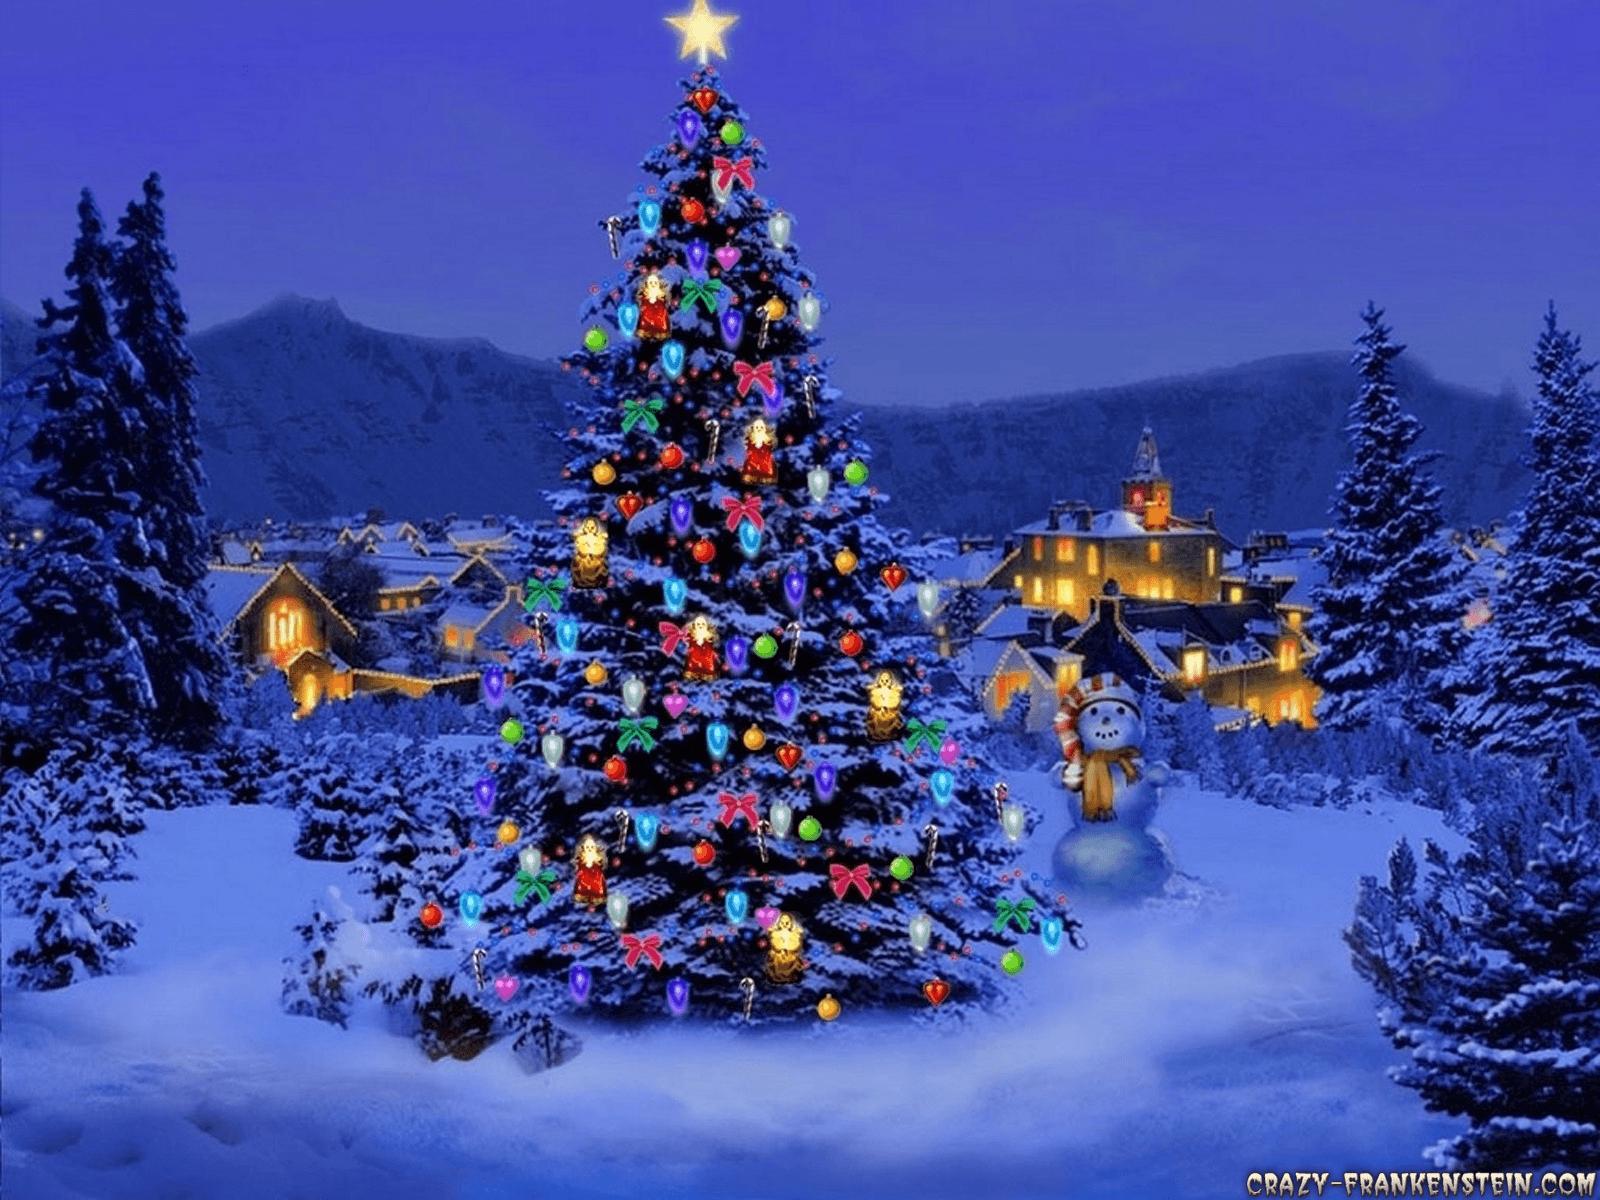 Full Screen Christmas Wallpapers - 4k ...